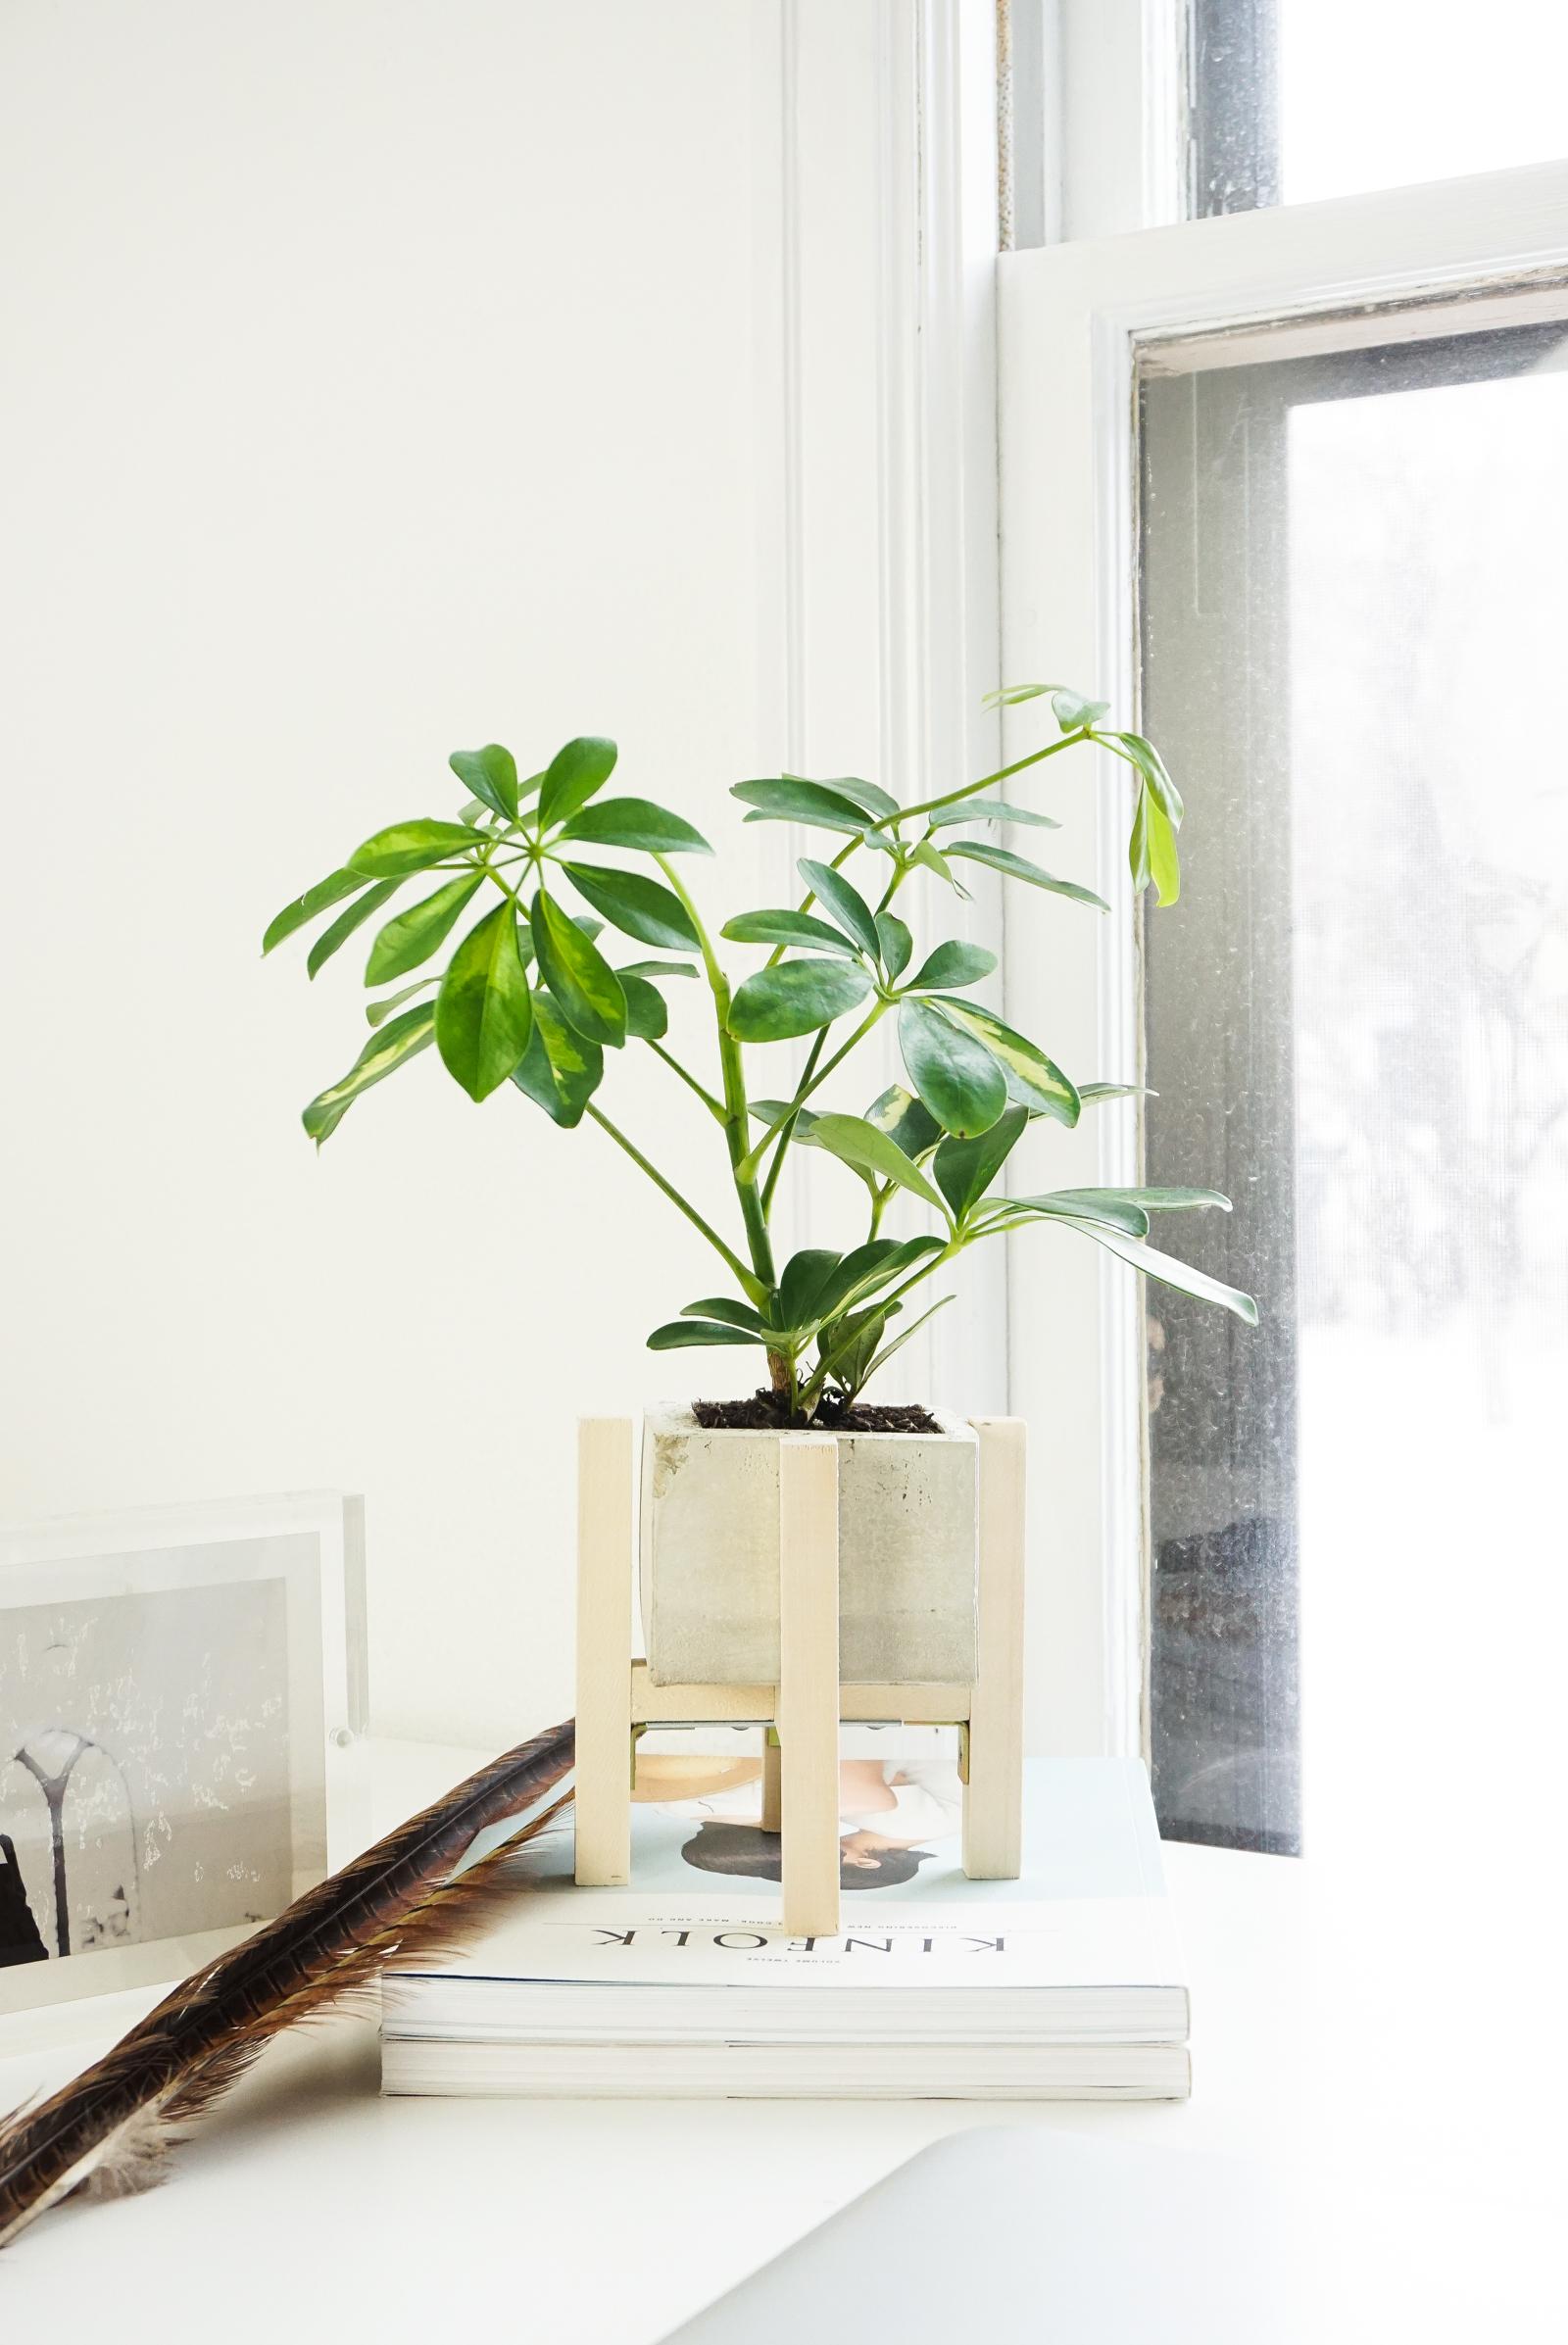 Concrete planter and stand